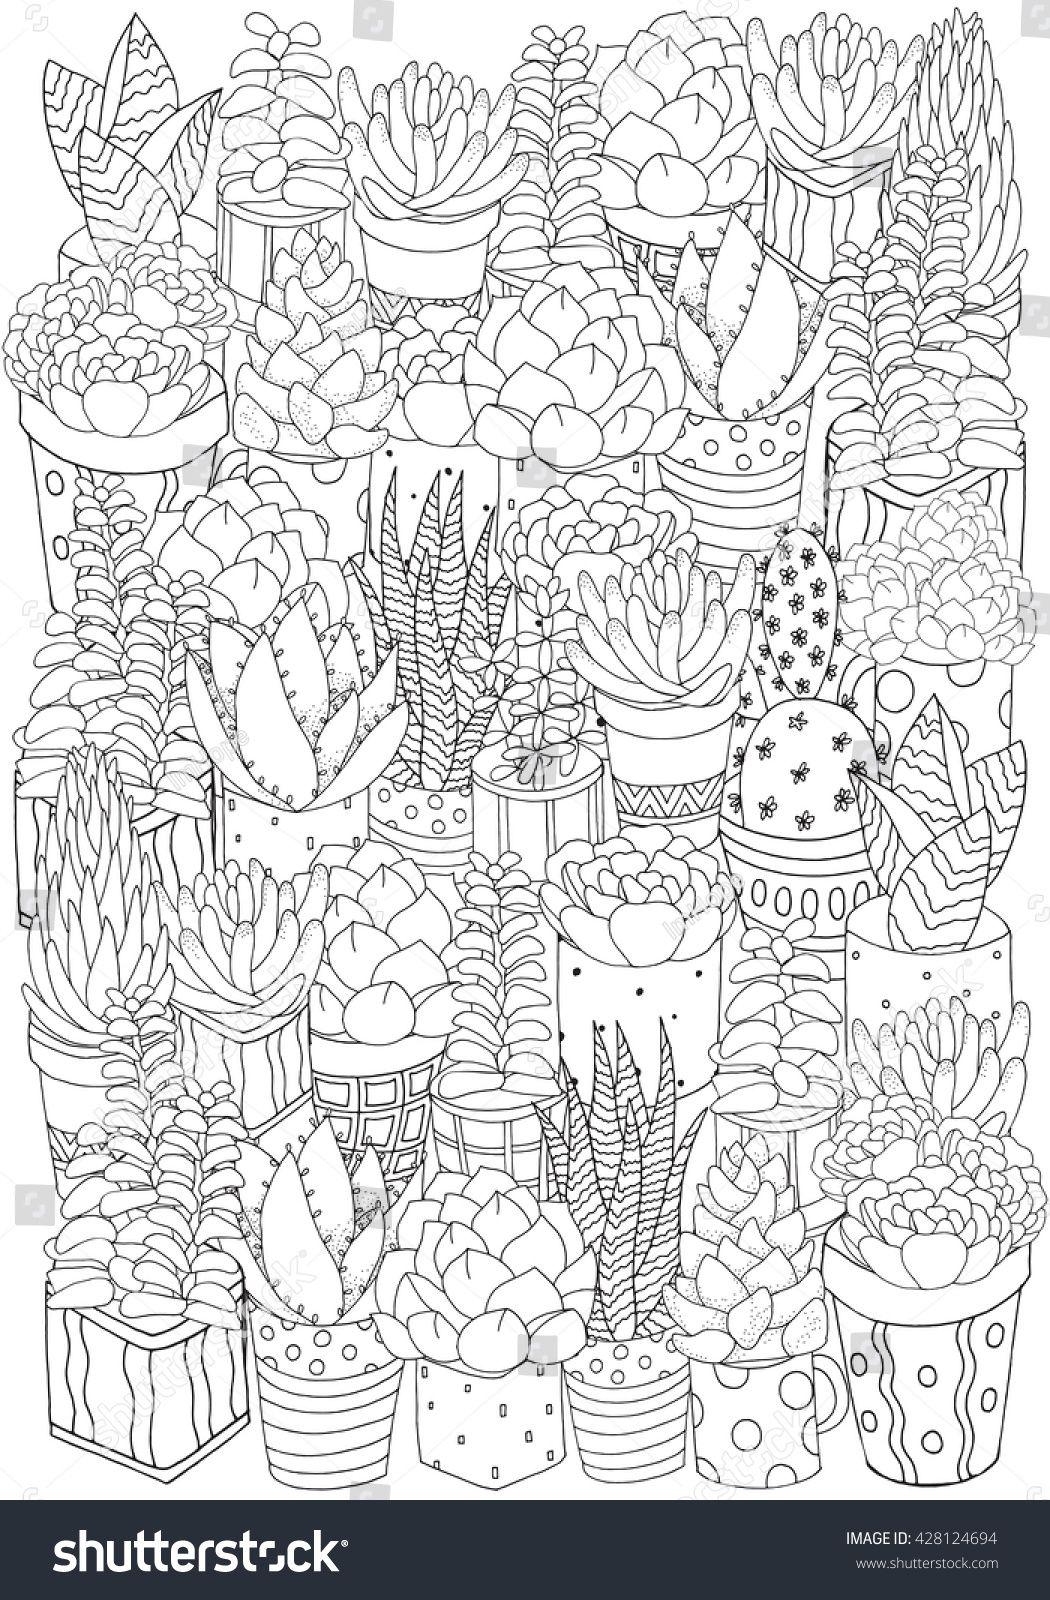 Hand Drawn Set Of Succulents Cactuses And Pots Doodles Elements